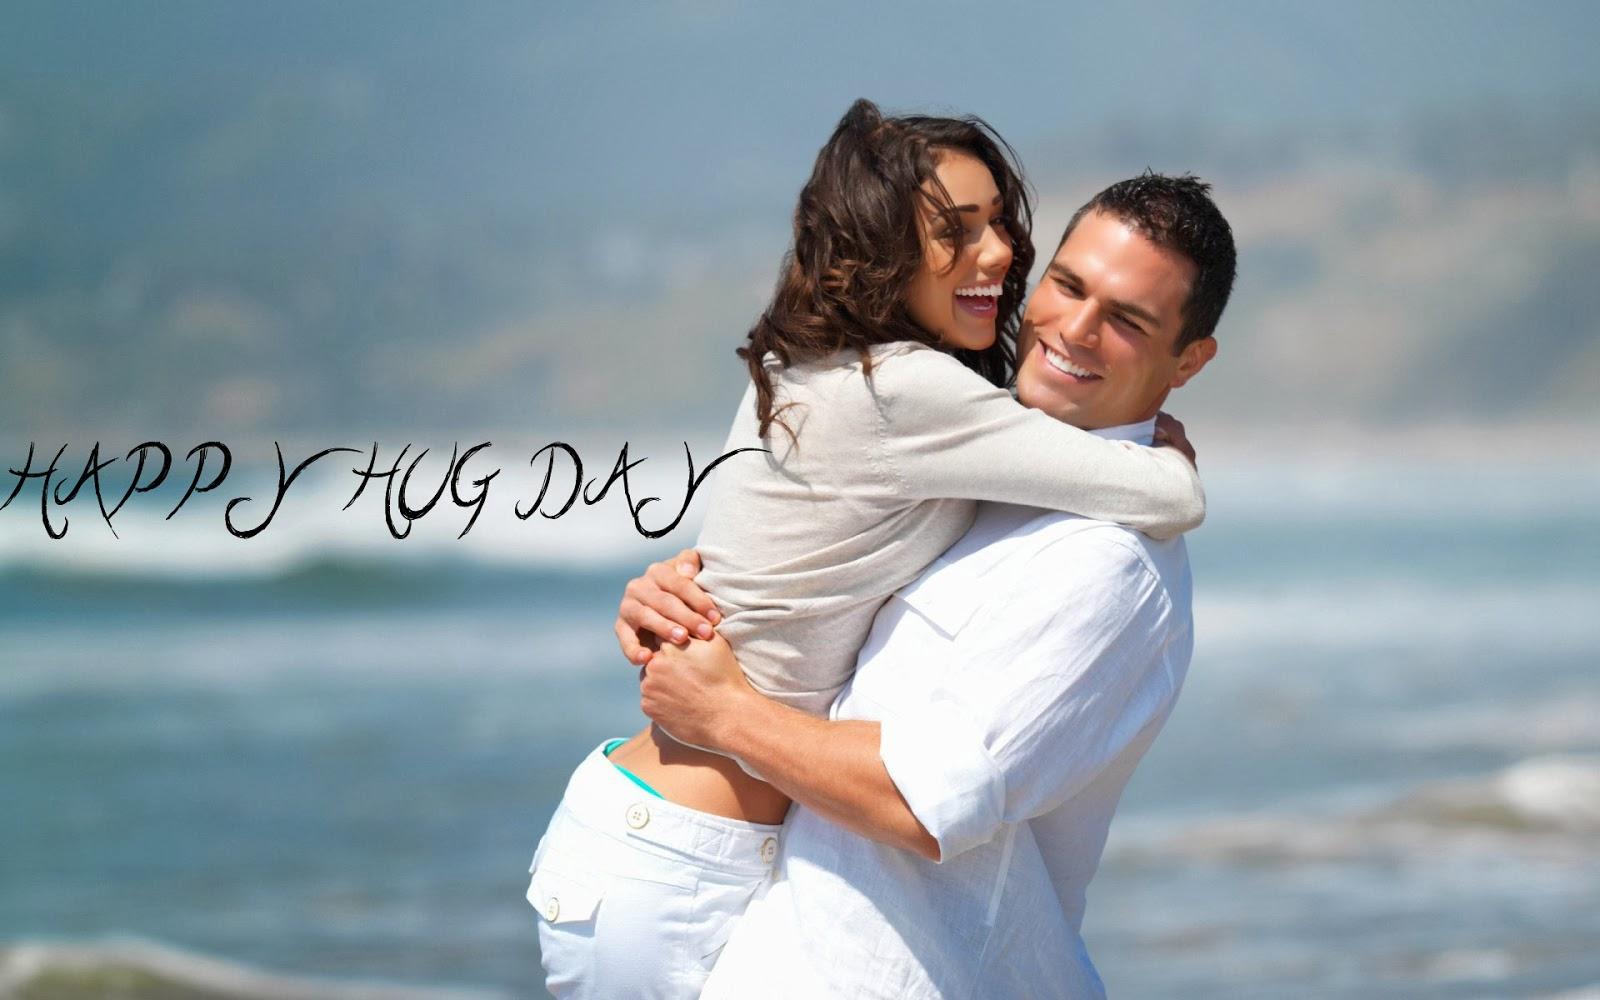 Happy Valentine Hug Day images Download